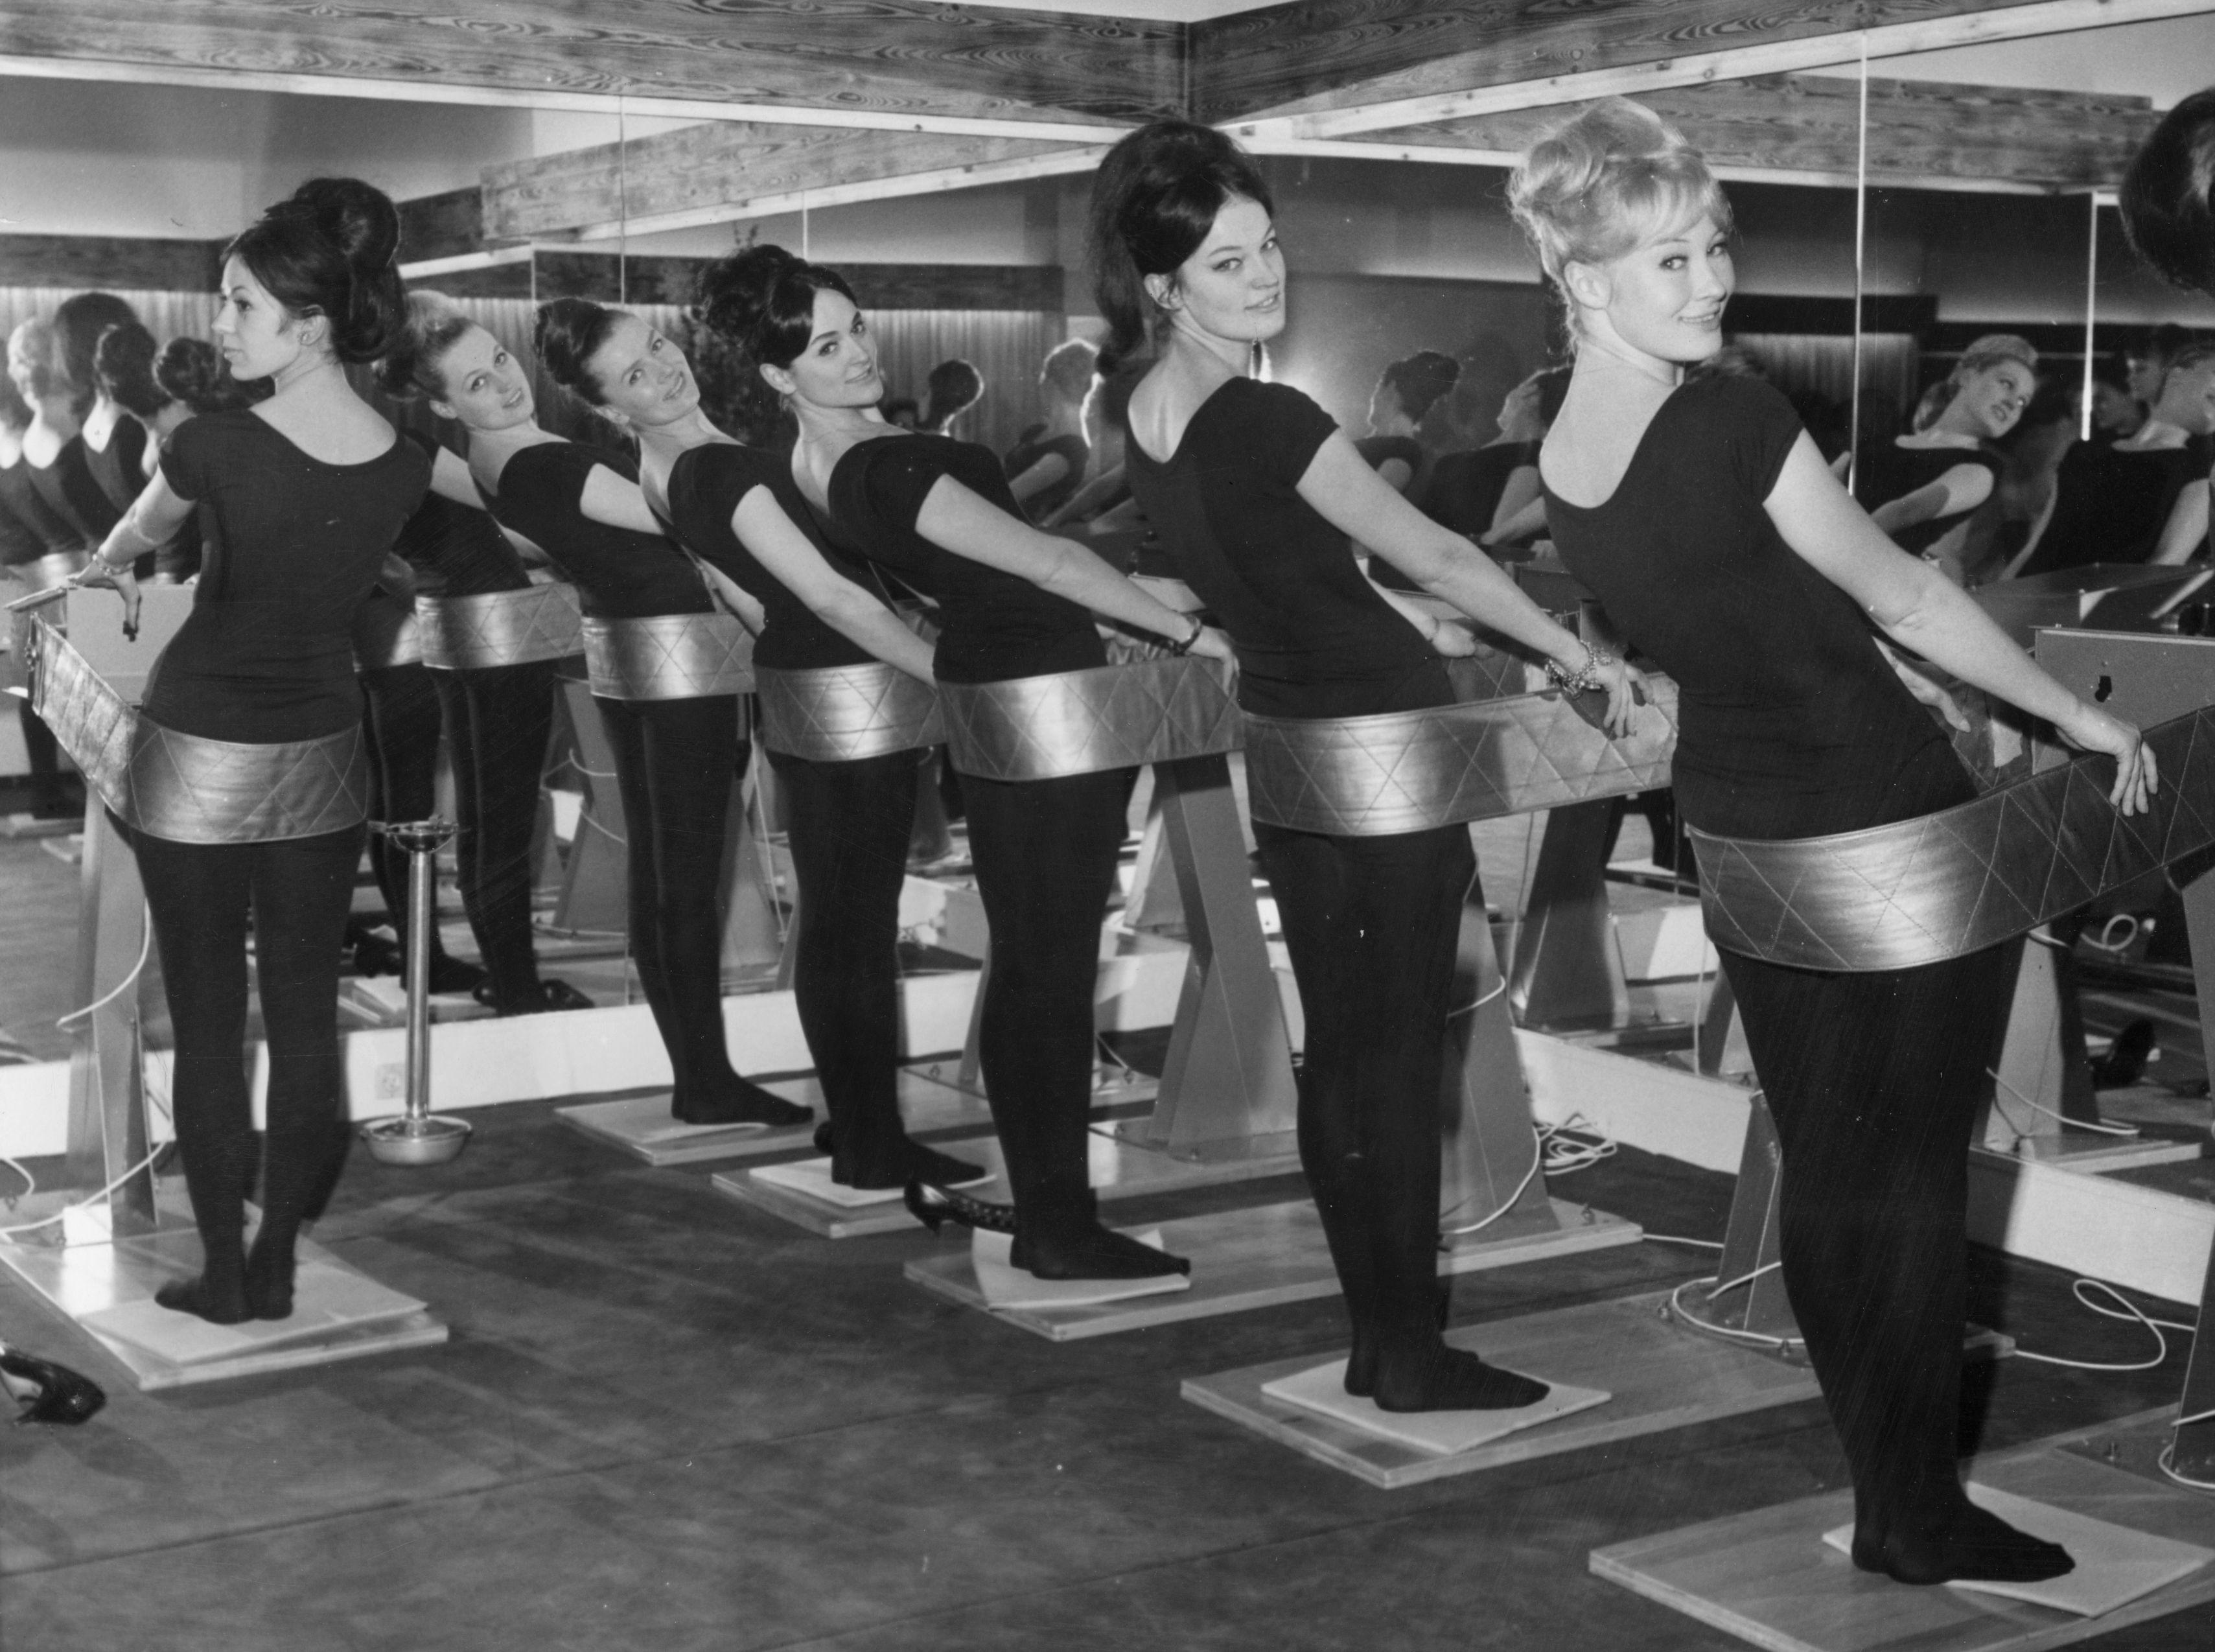 Old beauty training machine